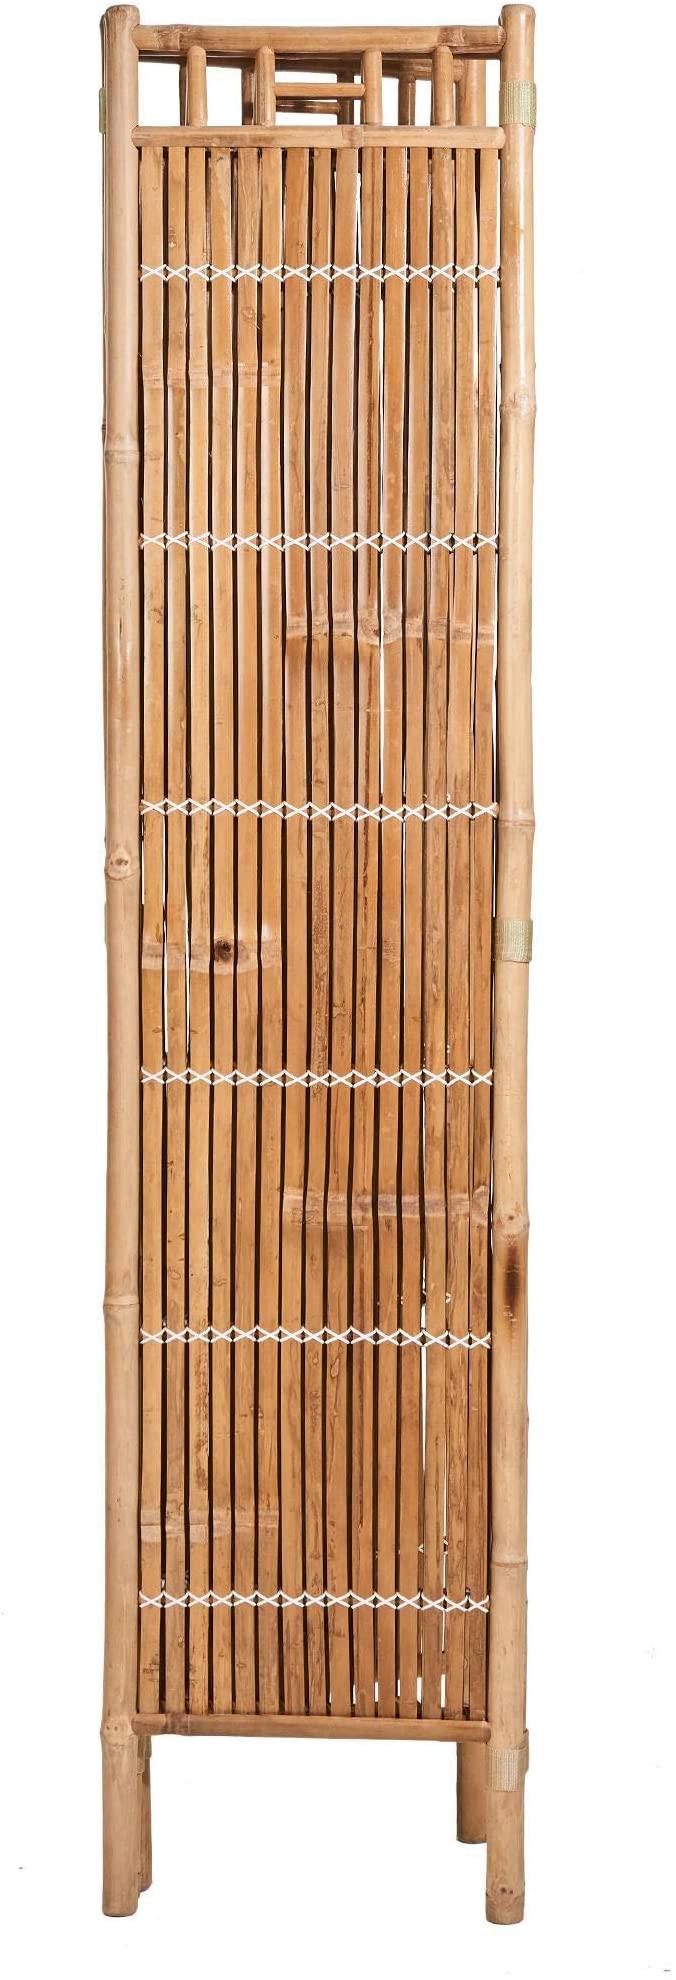 Full Size of Butlers Safari Paravent Bambus 120x4x180 Cm Brauner Raumteiler Garten Bett Wohnzimmer Paravent Bambus